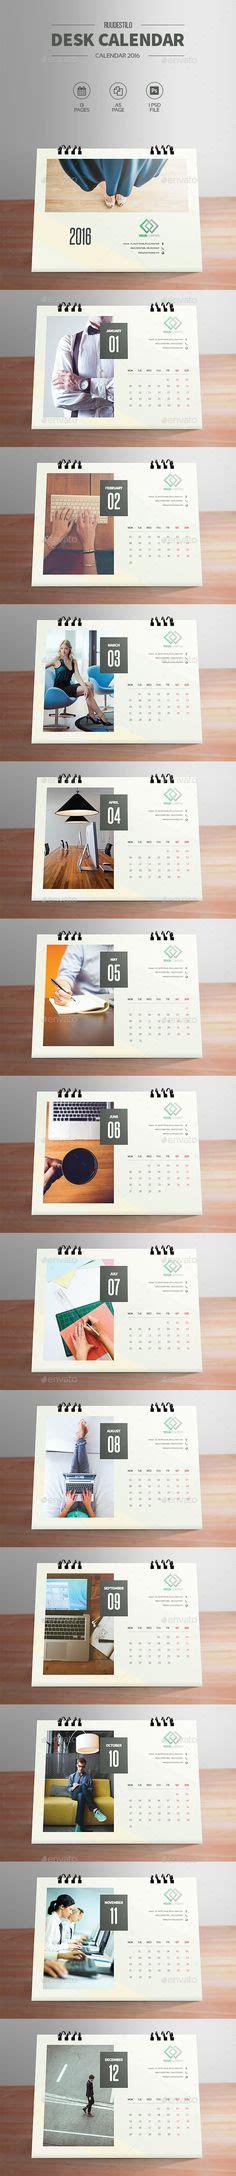 Kalender Meja 2017 Kartun Desk Calendar Creative Hka001 40 Creative Calendar Design Ideas For 2014 Paper Creative Calendar And Calendar